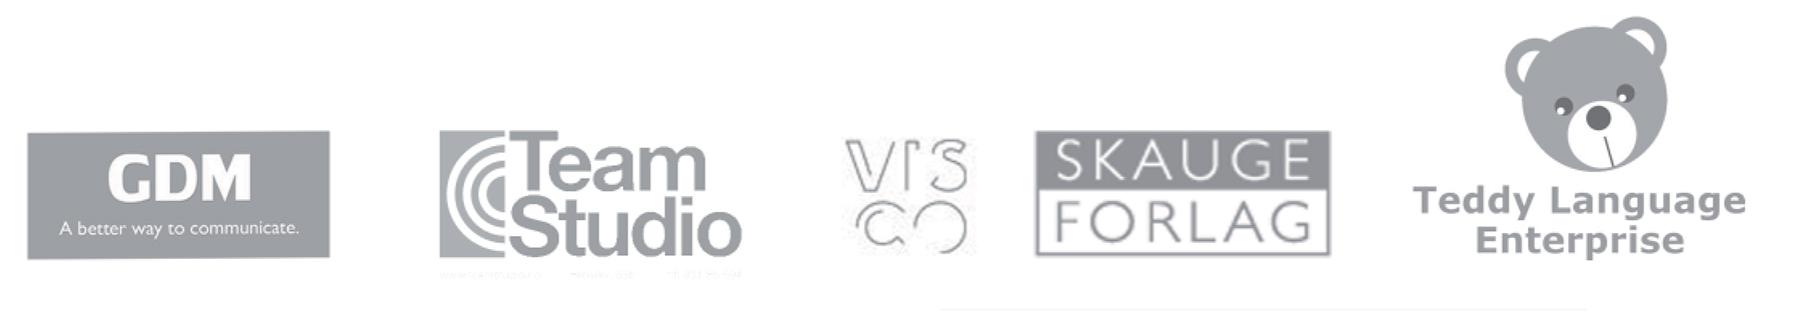 logos web.jpg